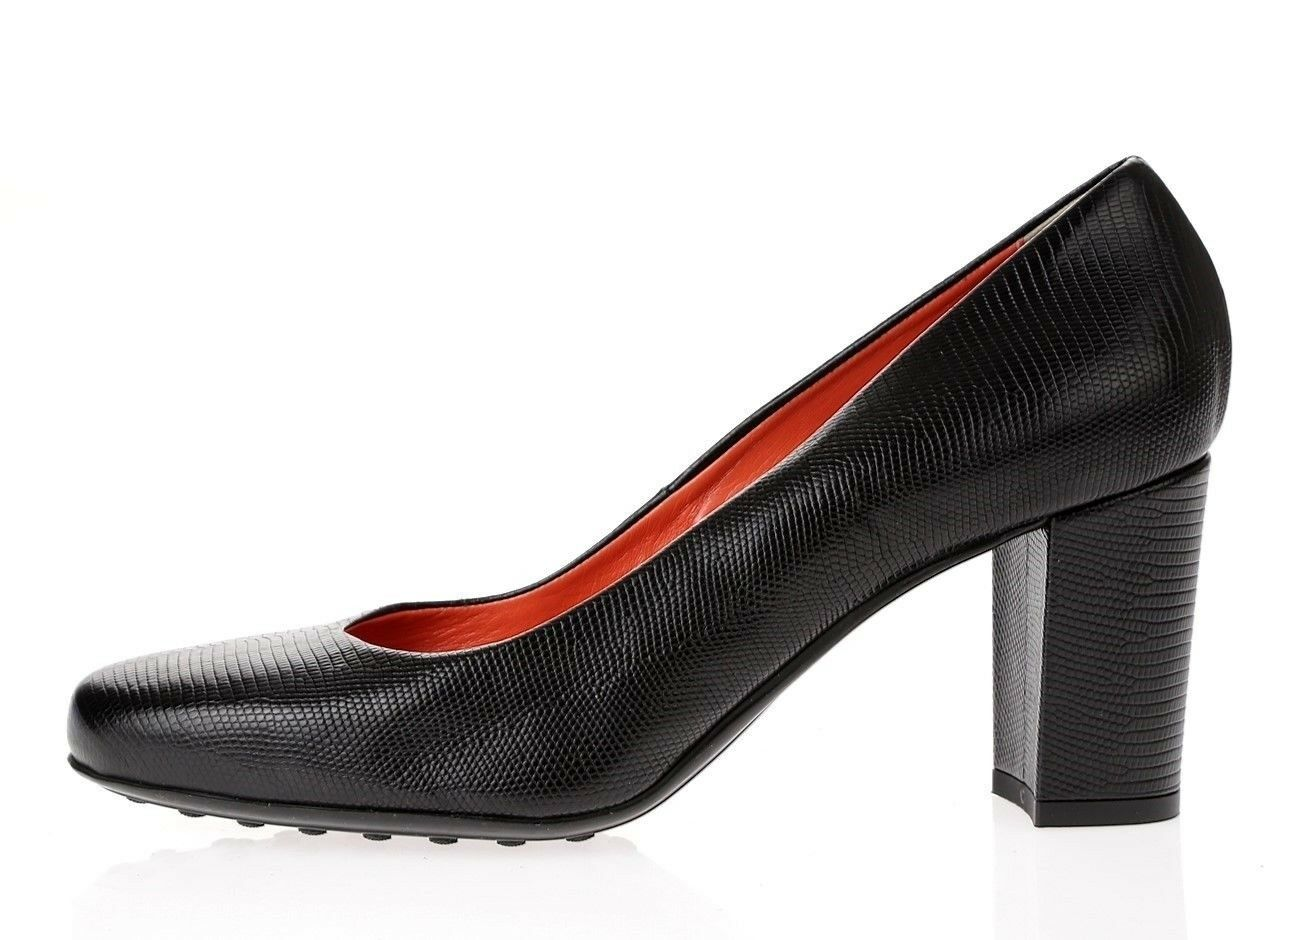 Womens AQUATALIA black snake print leather pumps shoes sz. sz. sz. 9.5 M NEW 50e3cc